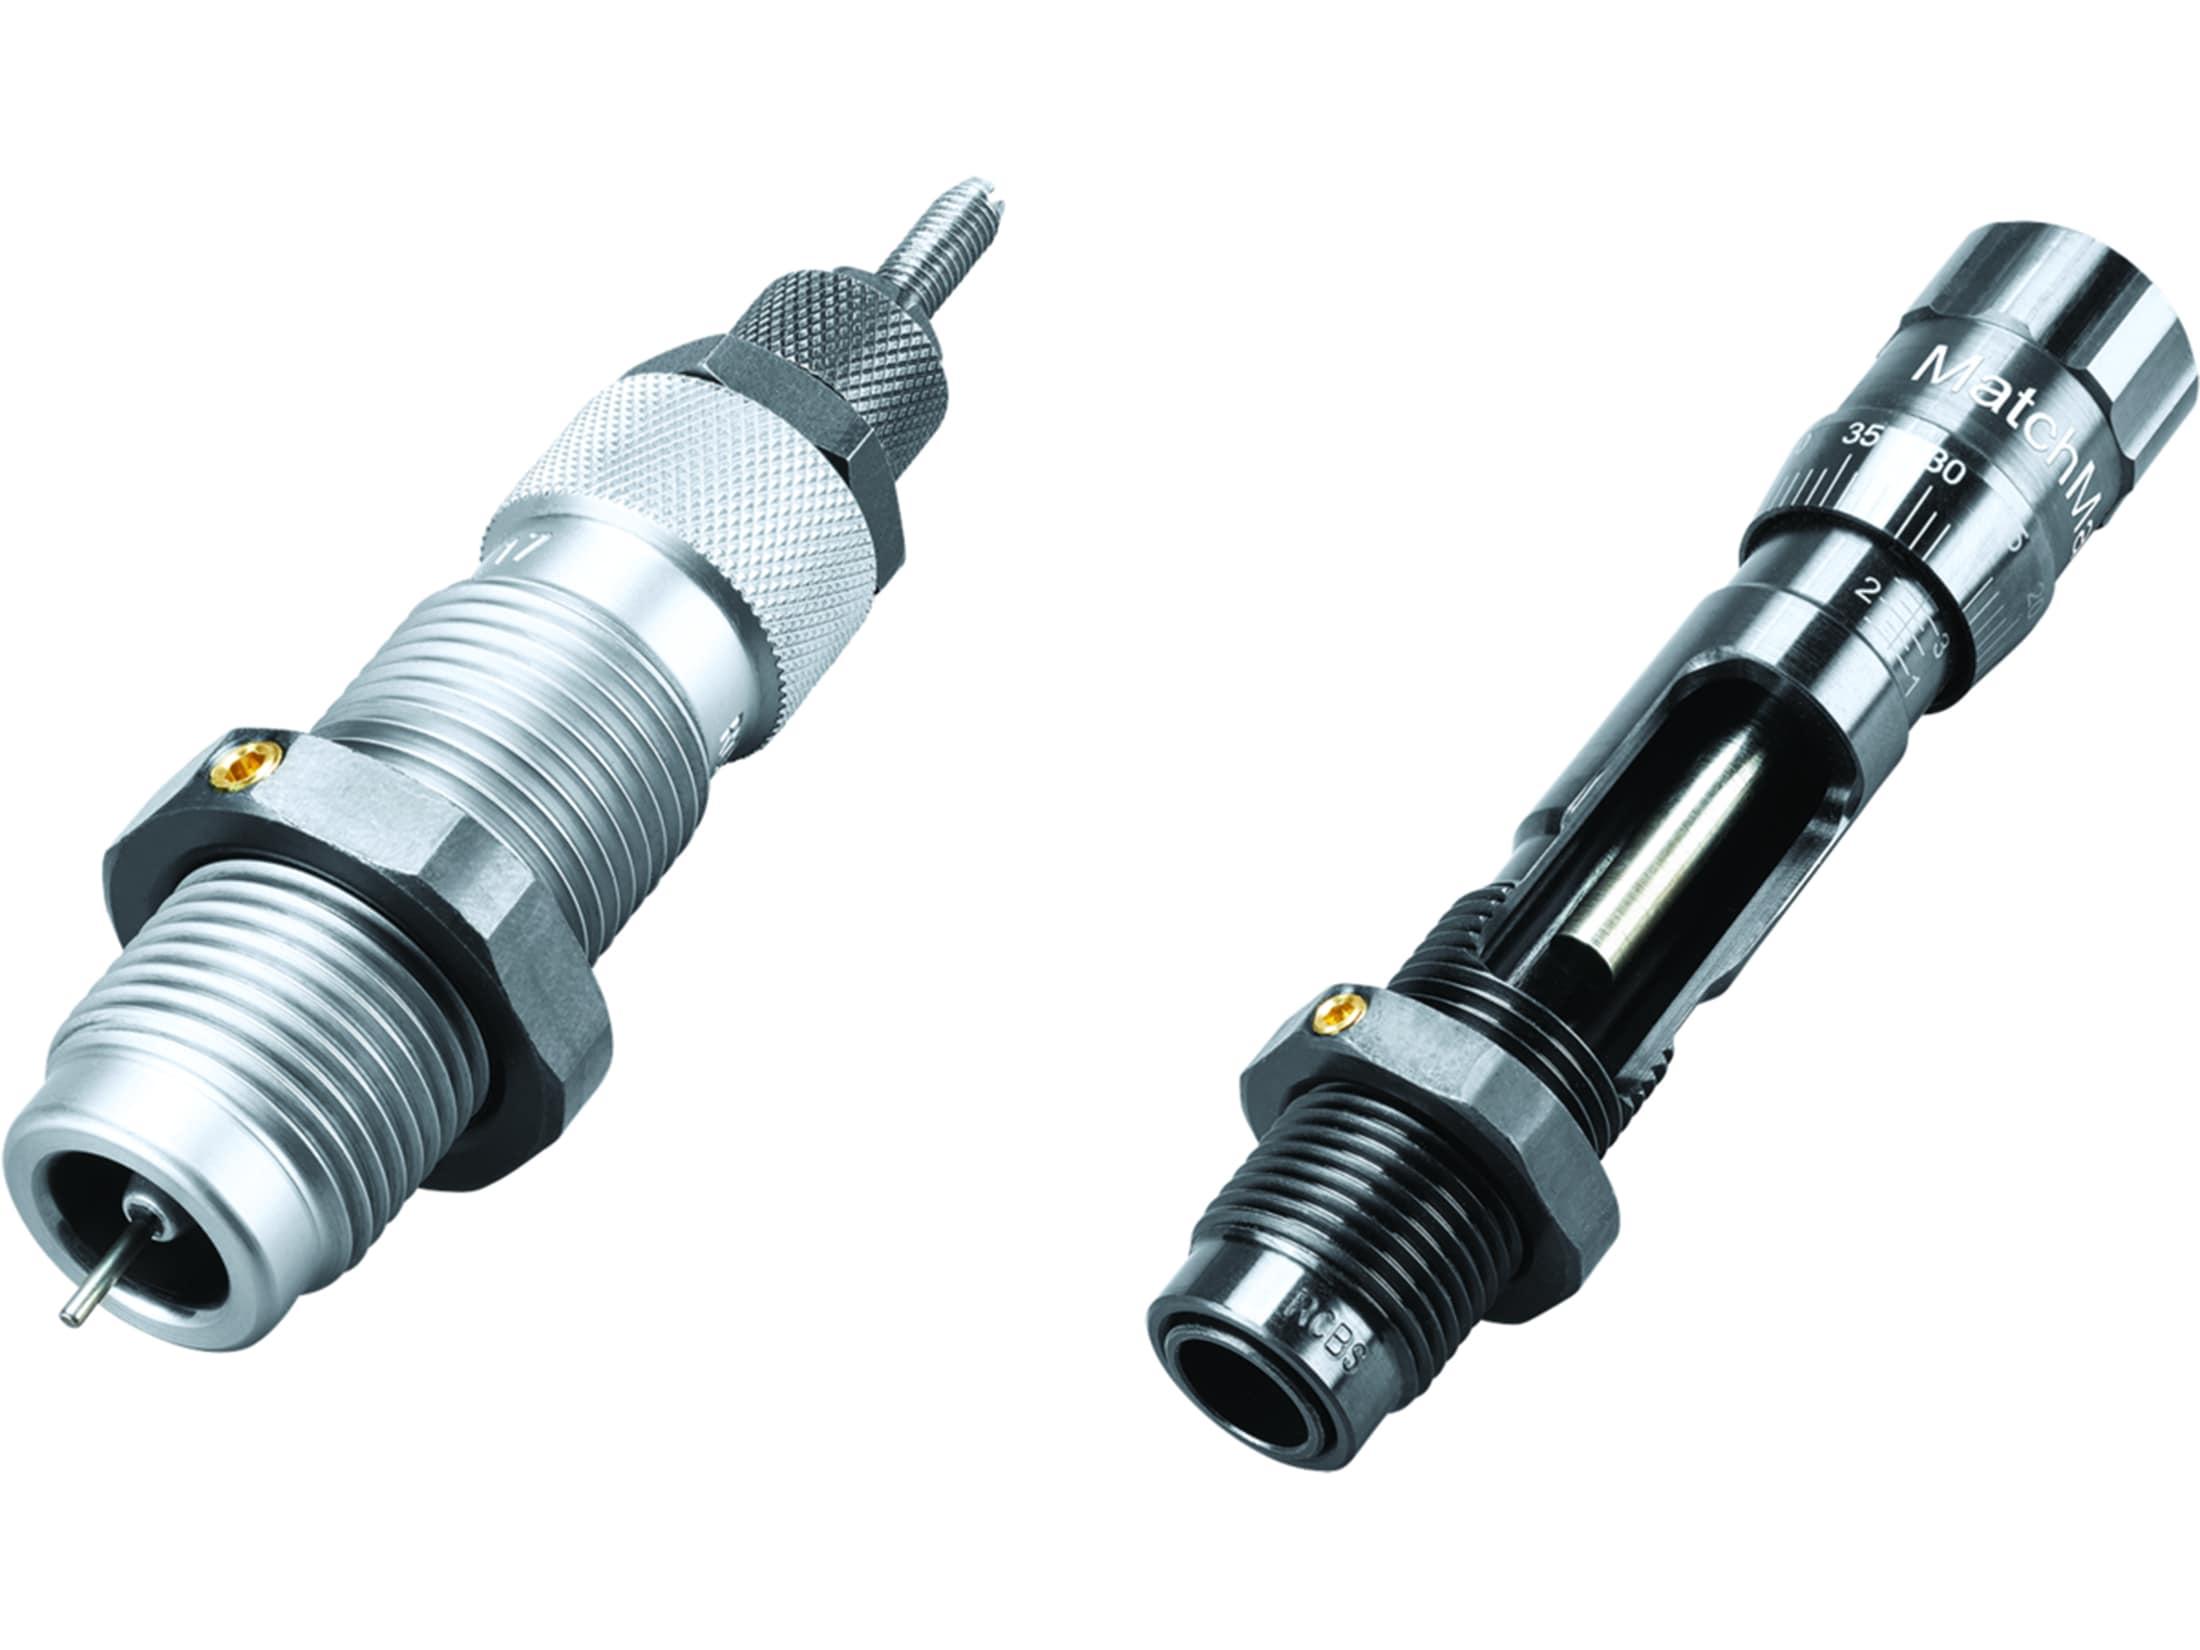 RCBS Powder MatchMaster Nozzle Orifice Set of 6 Pieces S-M-L Reloading *Green*